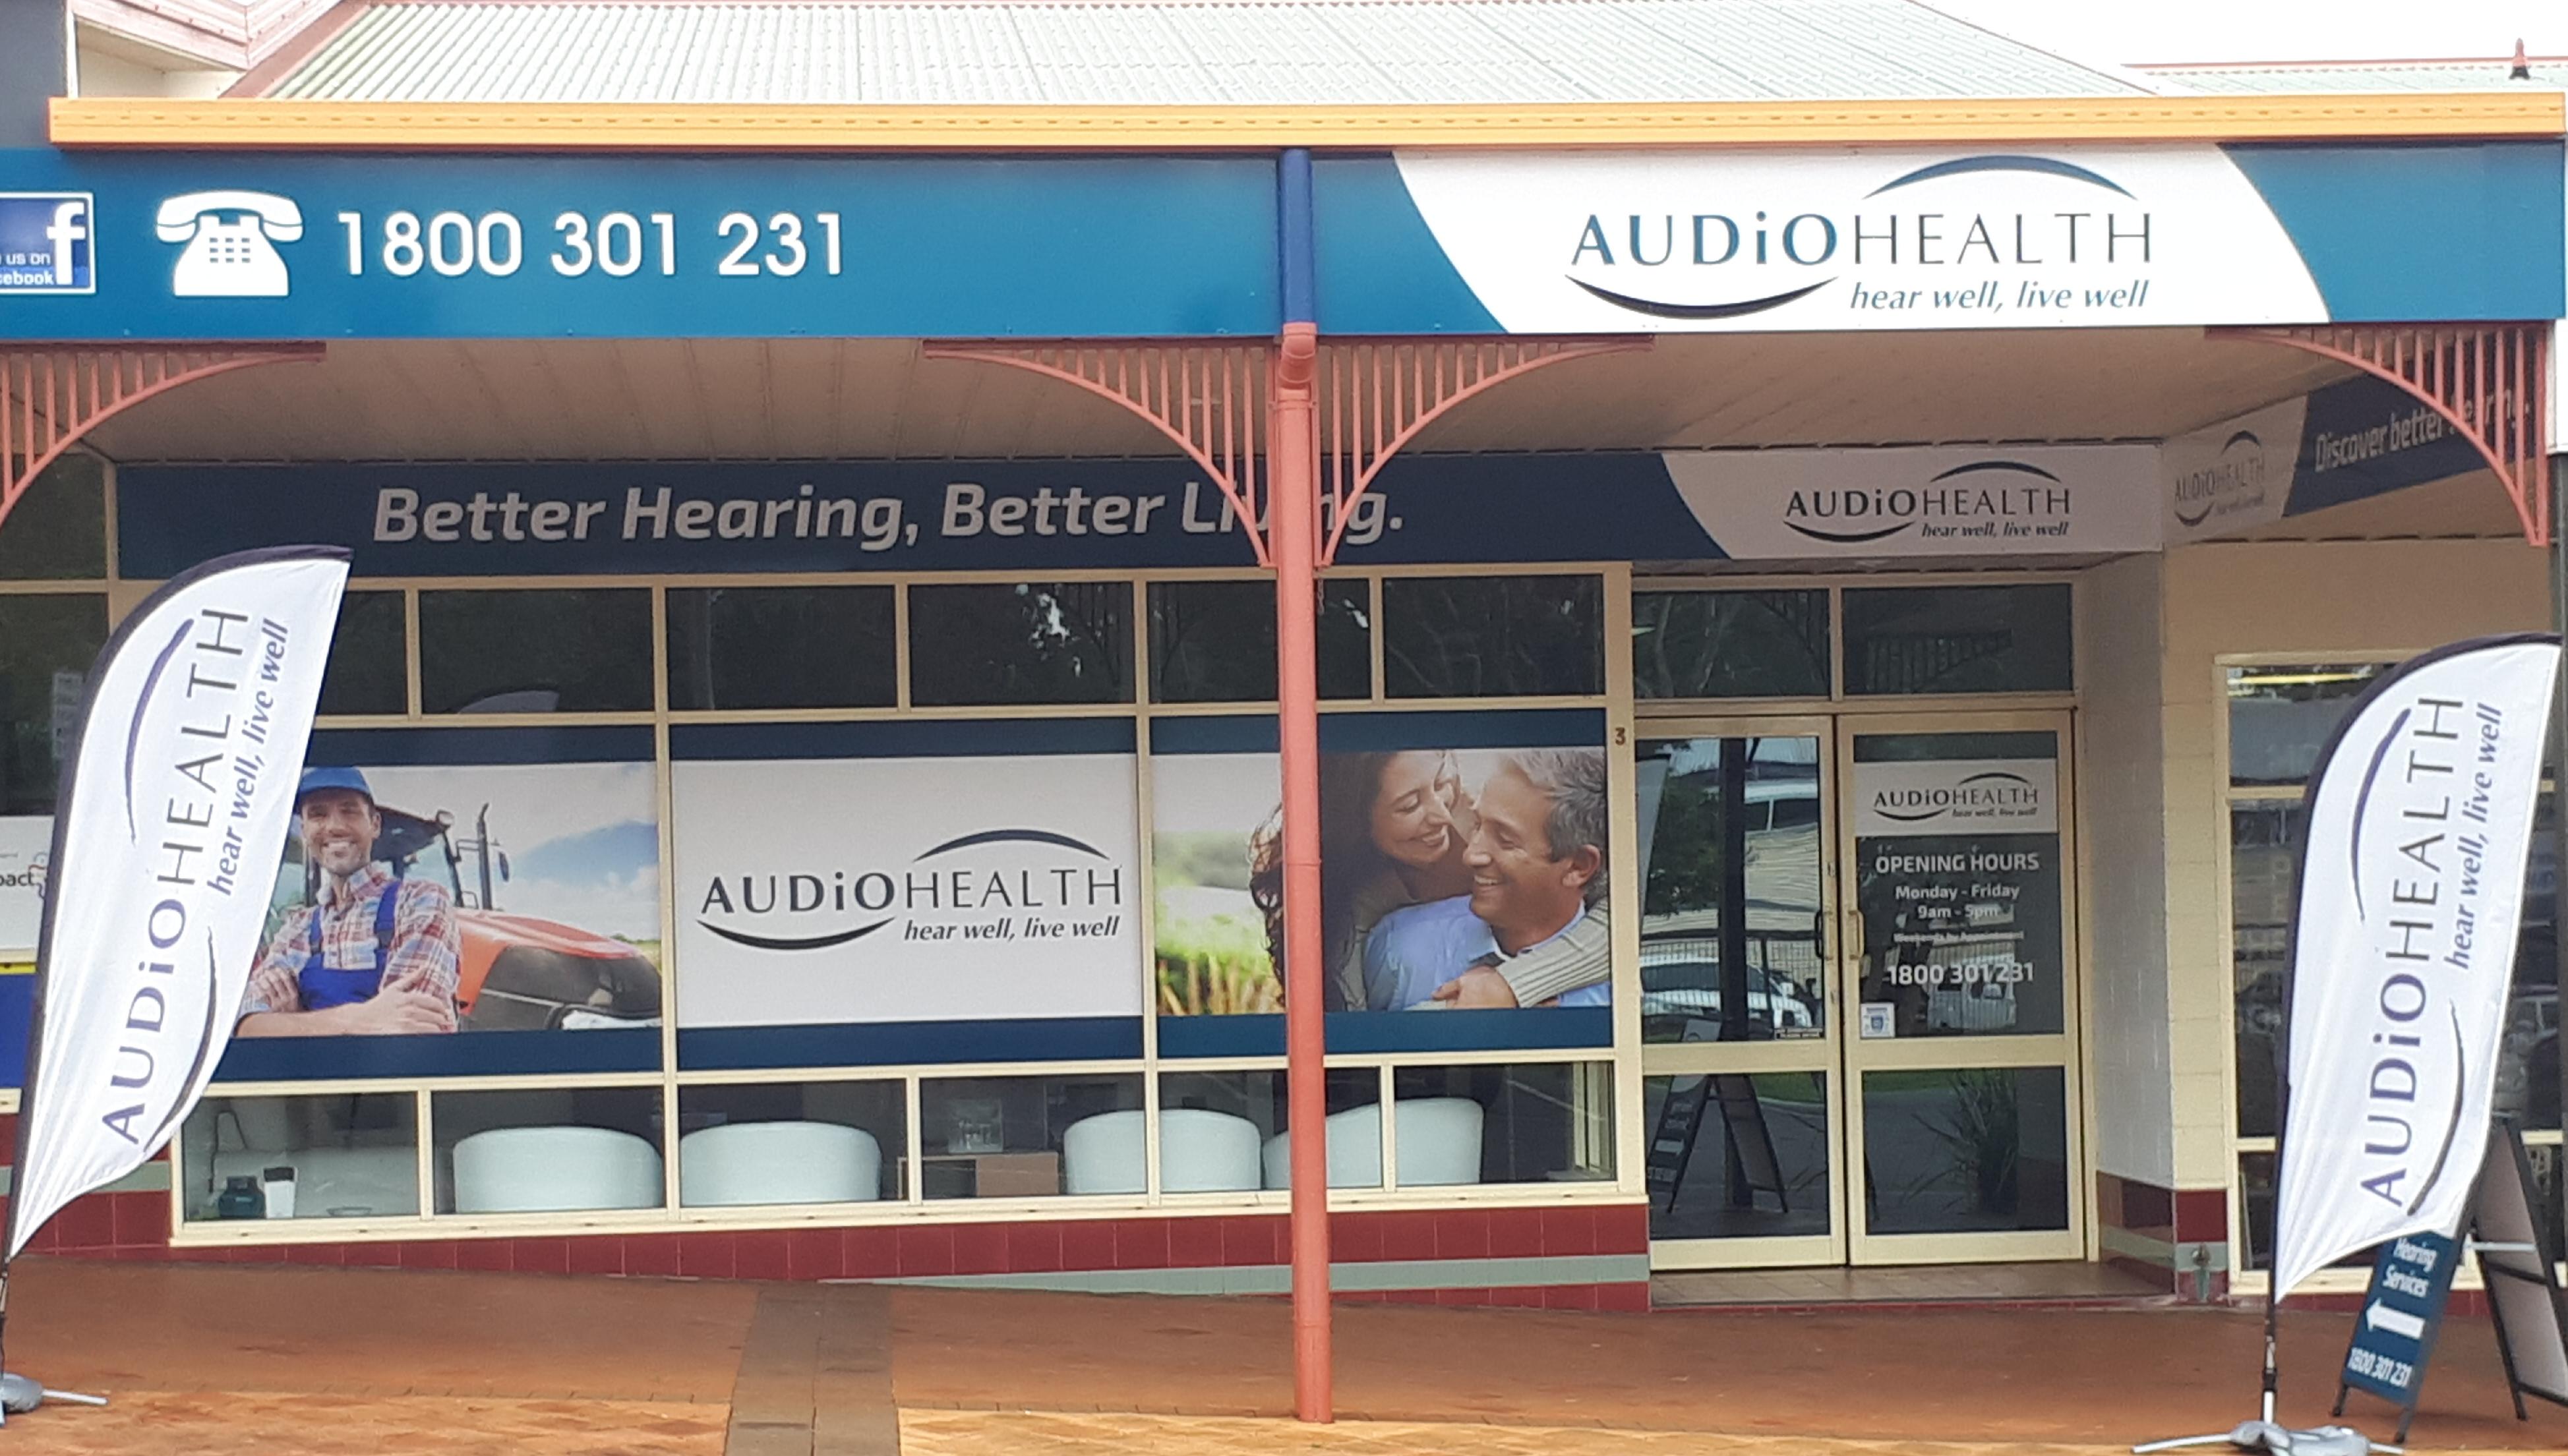 Audio Health - Atherton, QLD 4883 - 1800 301 231   ShowMeLocal.com